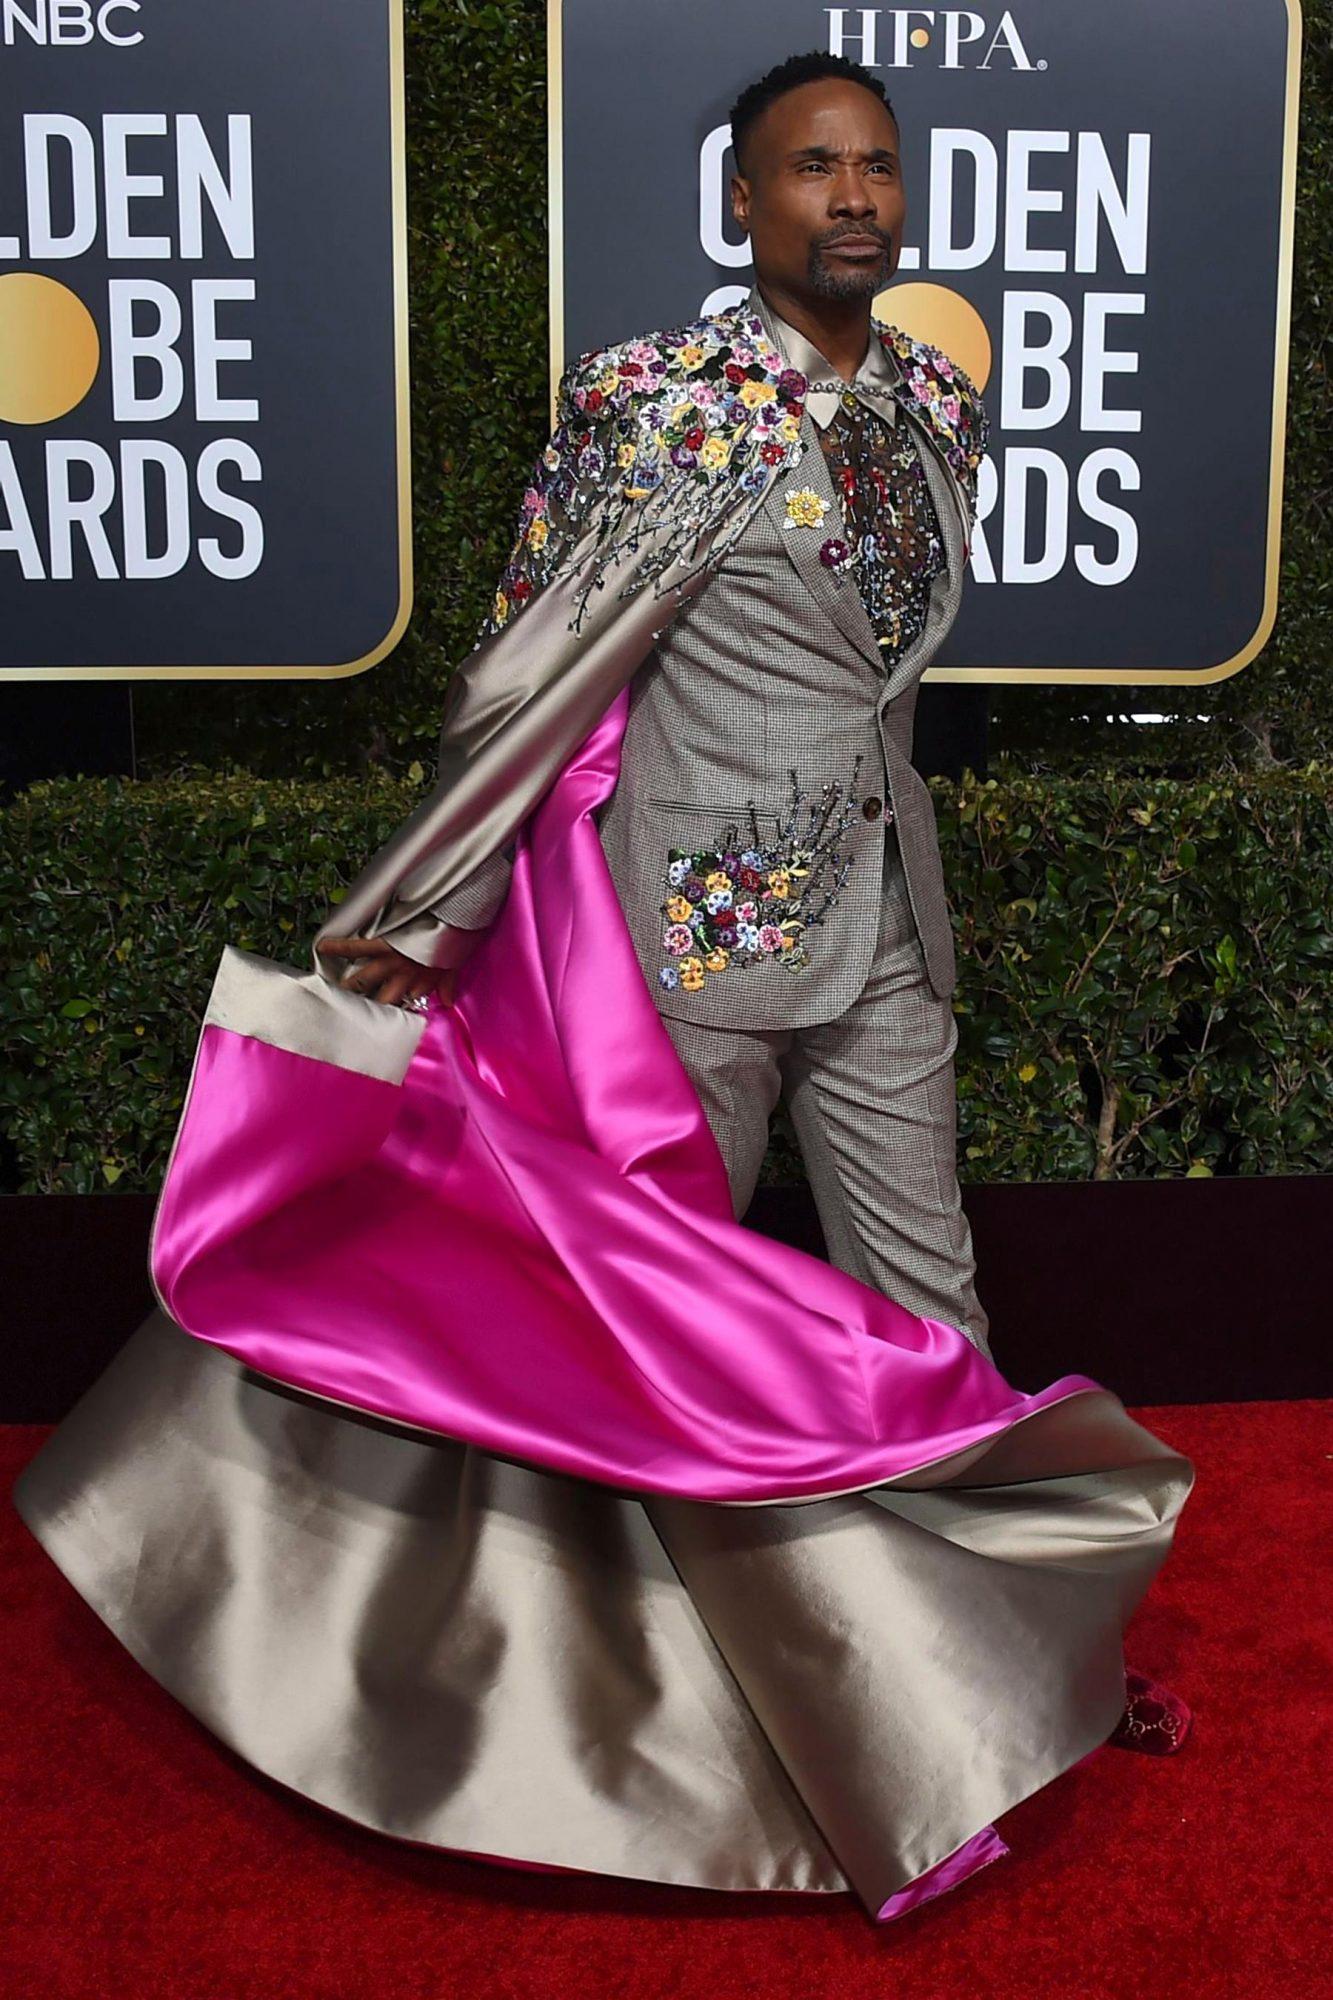 76th Annual Golden Globe Awards - Arrivals, Beverly Hills, USA - 06 Jan 2019